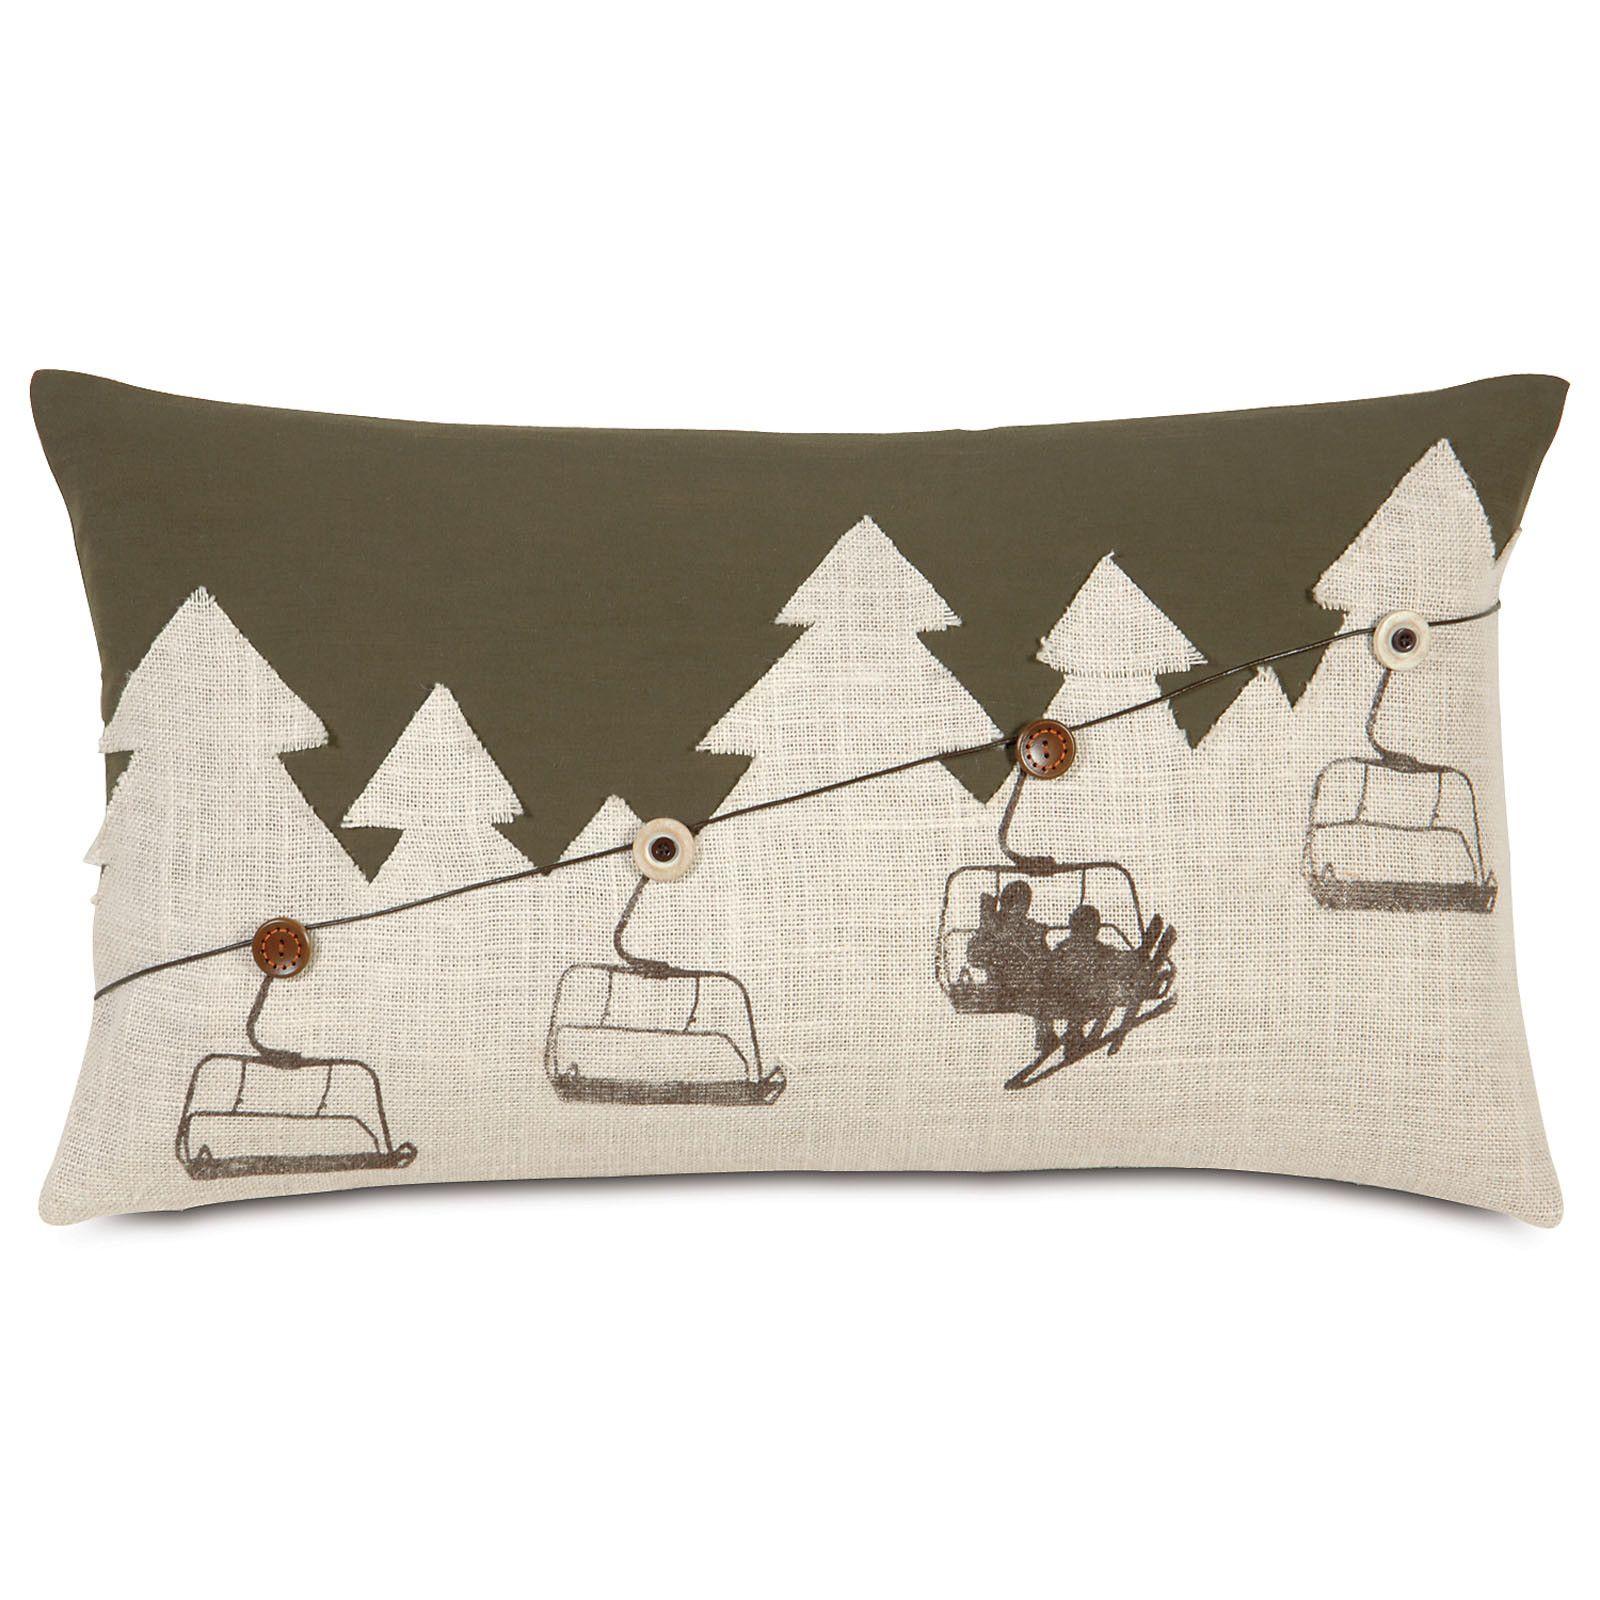 Eastern Accents Ski Lodge Up Lift Lumbar Pillow Ski House Decor Ski Lodge Decor Ski Decor